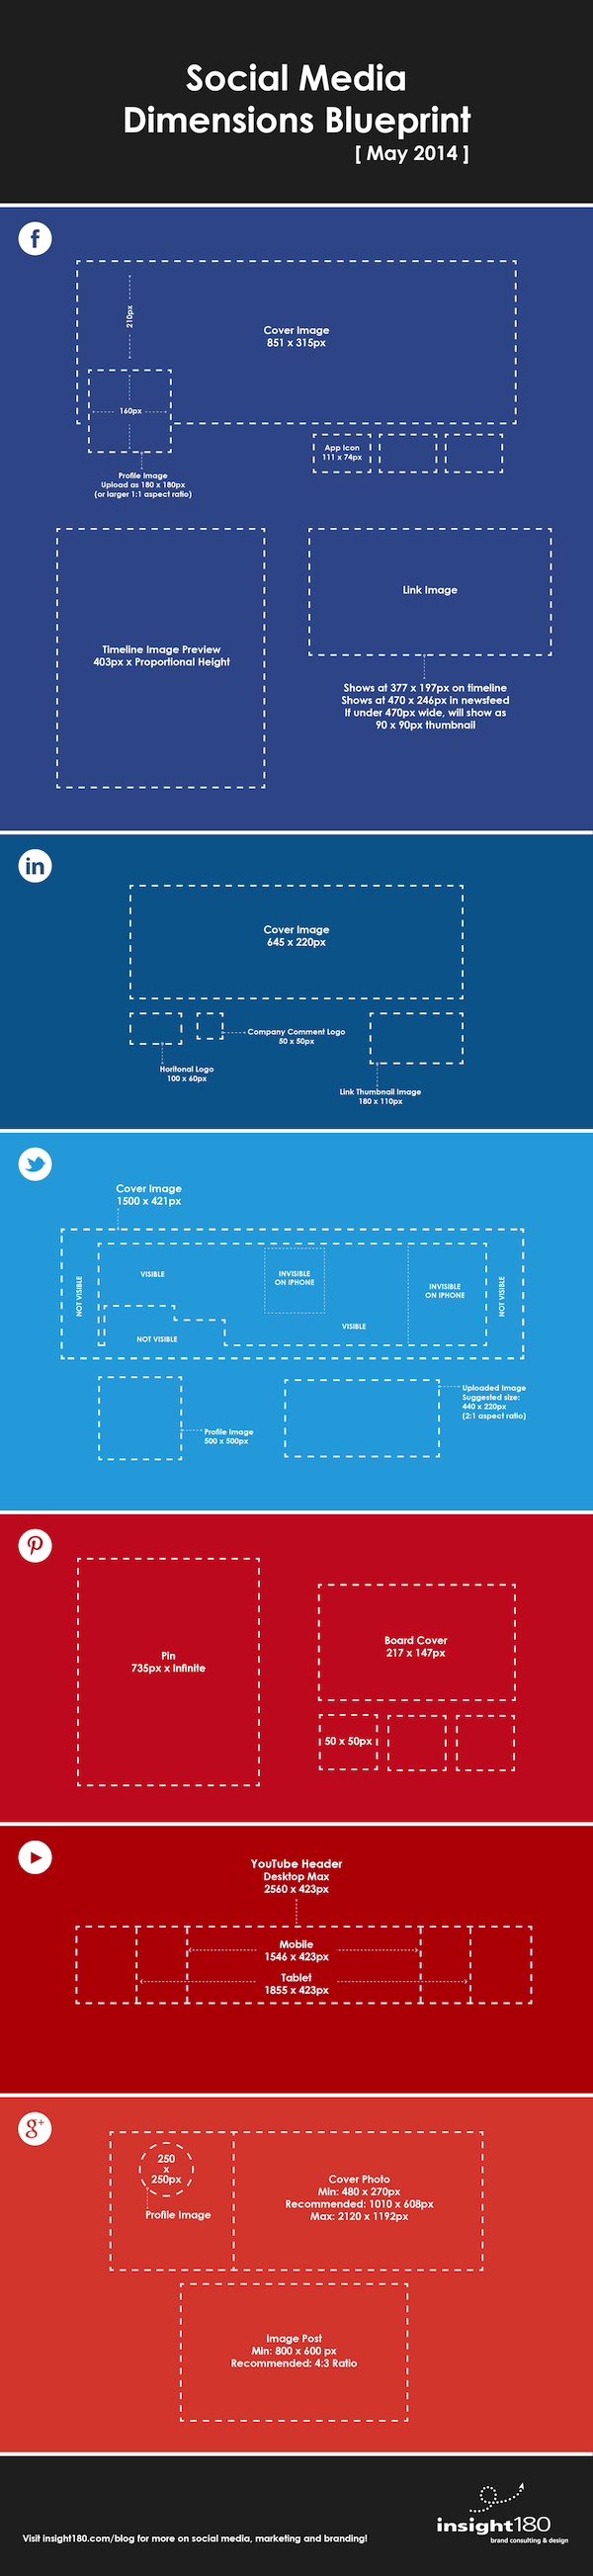 social-media-image-dimensions